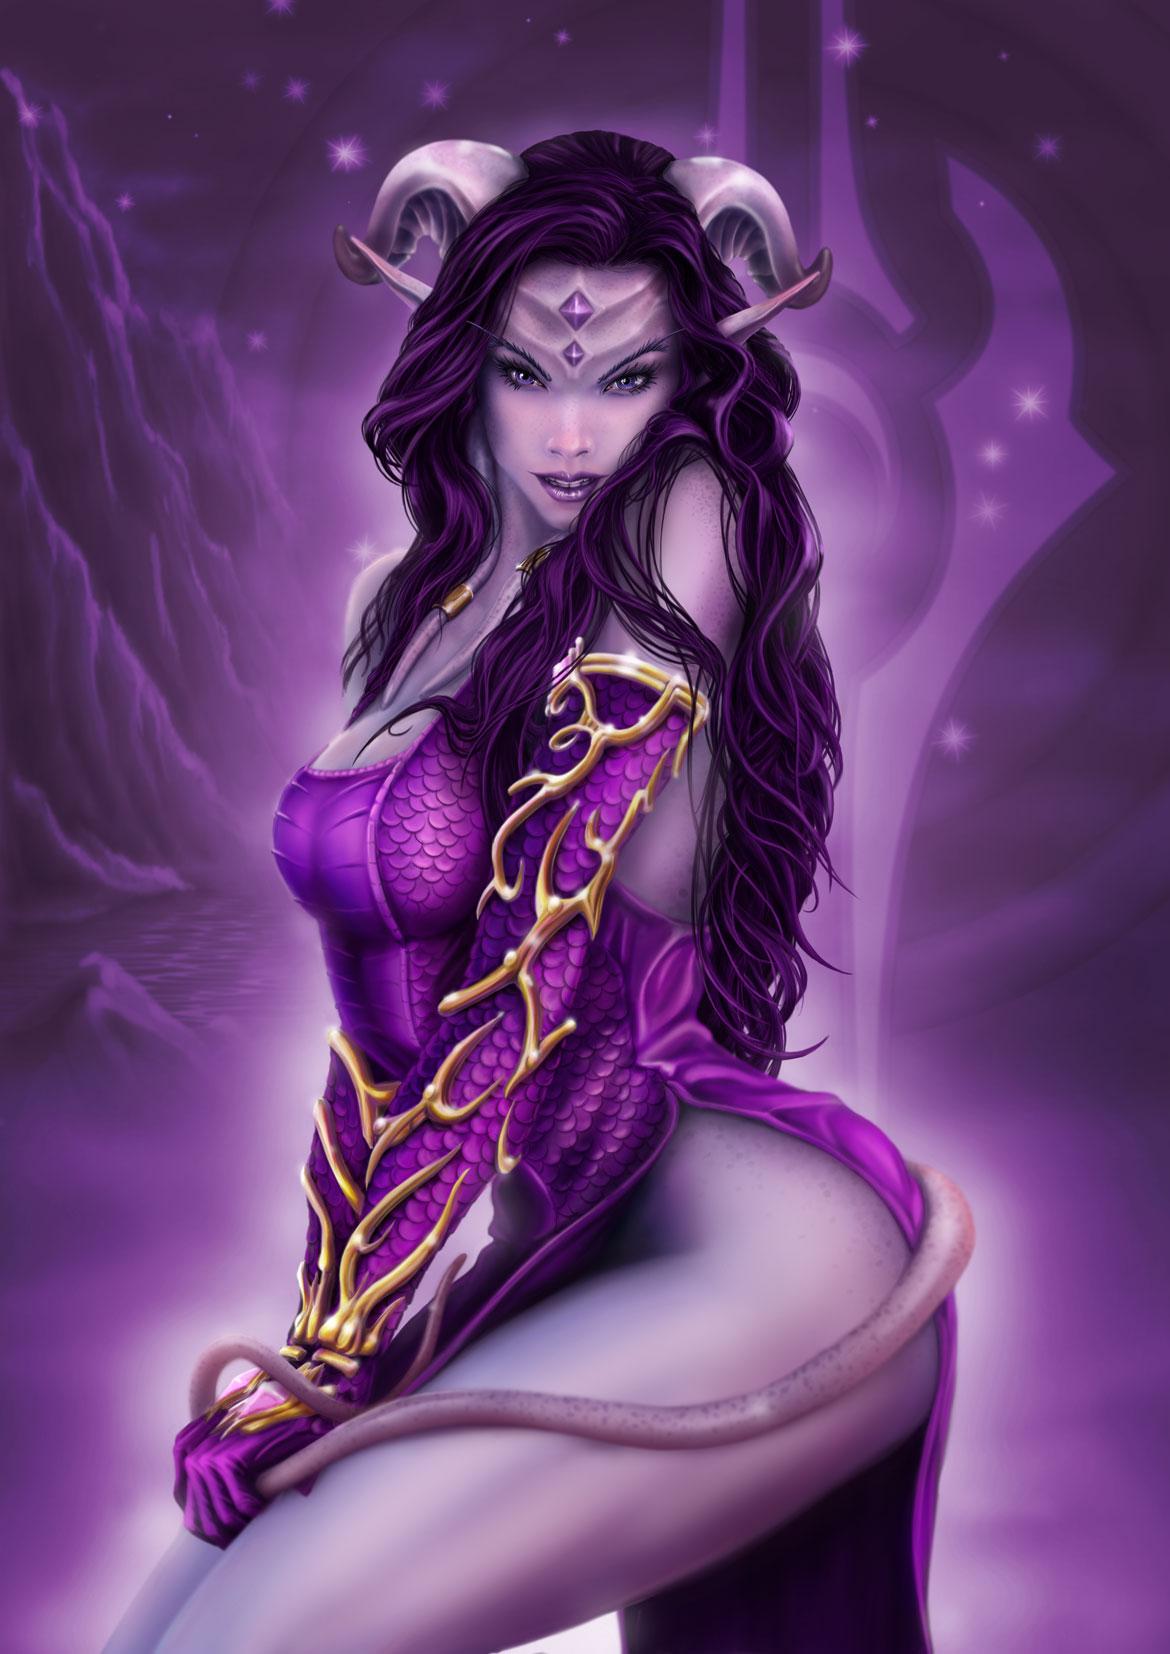 World of warcraft draenei female hot art  hentia toons